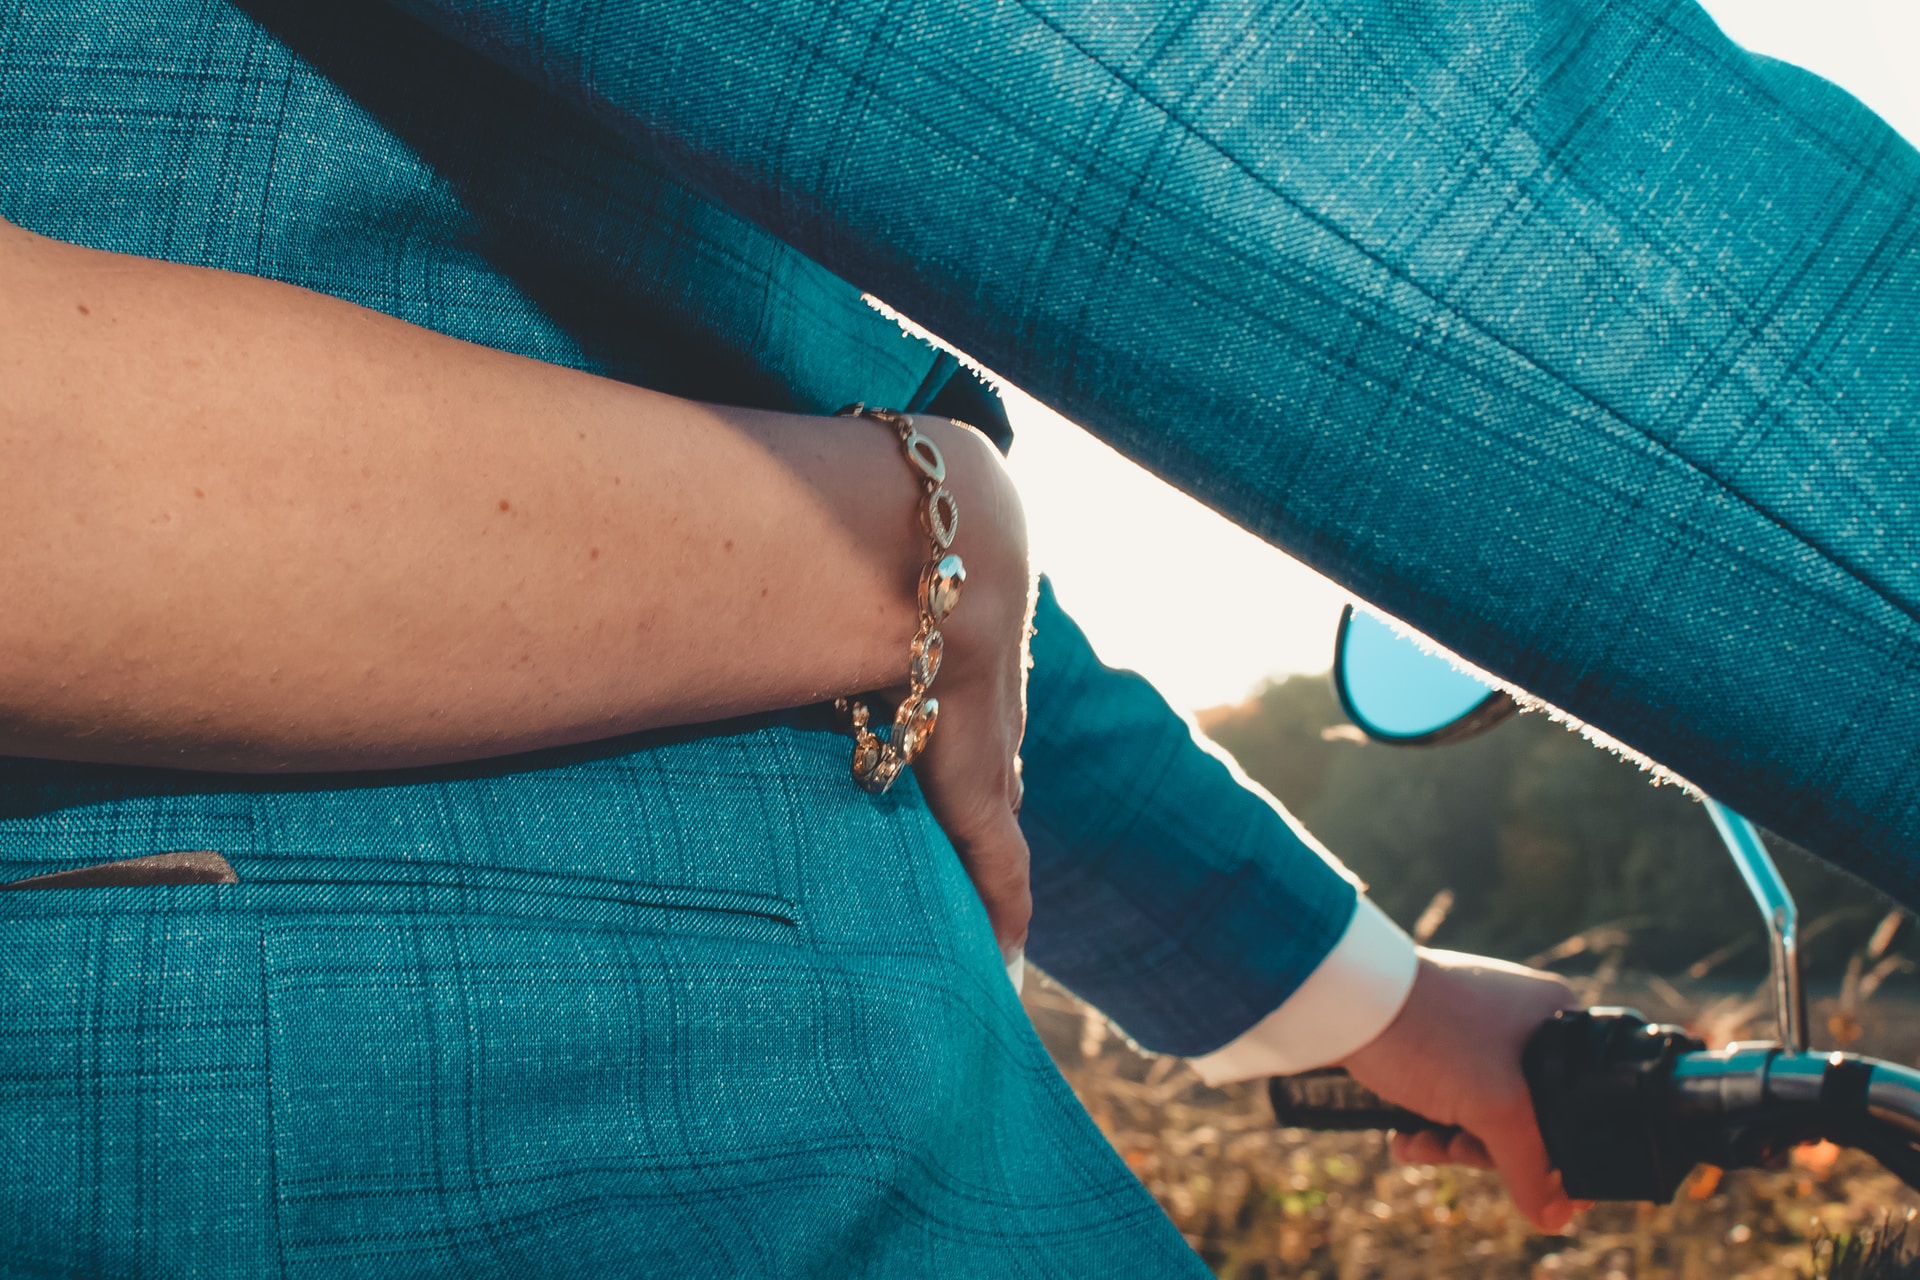 tips για ομαλό γαμήλιο ταξίδι